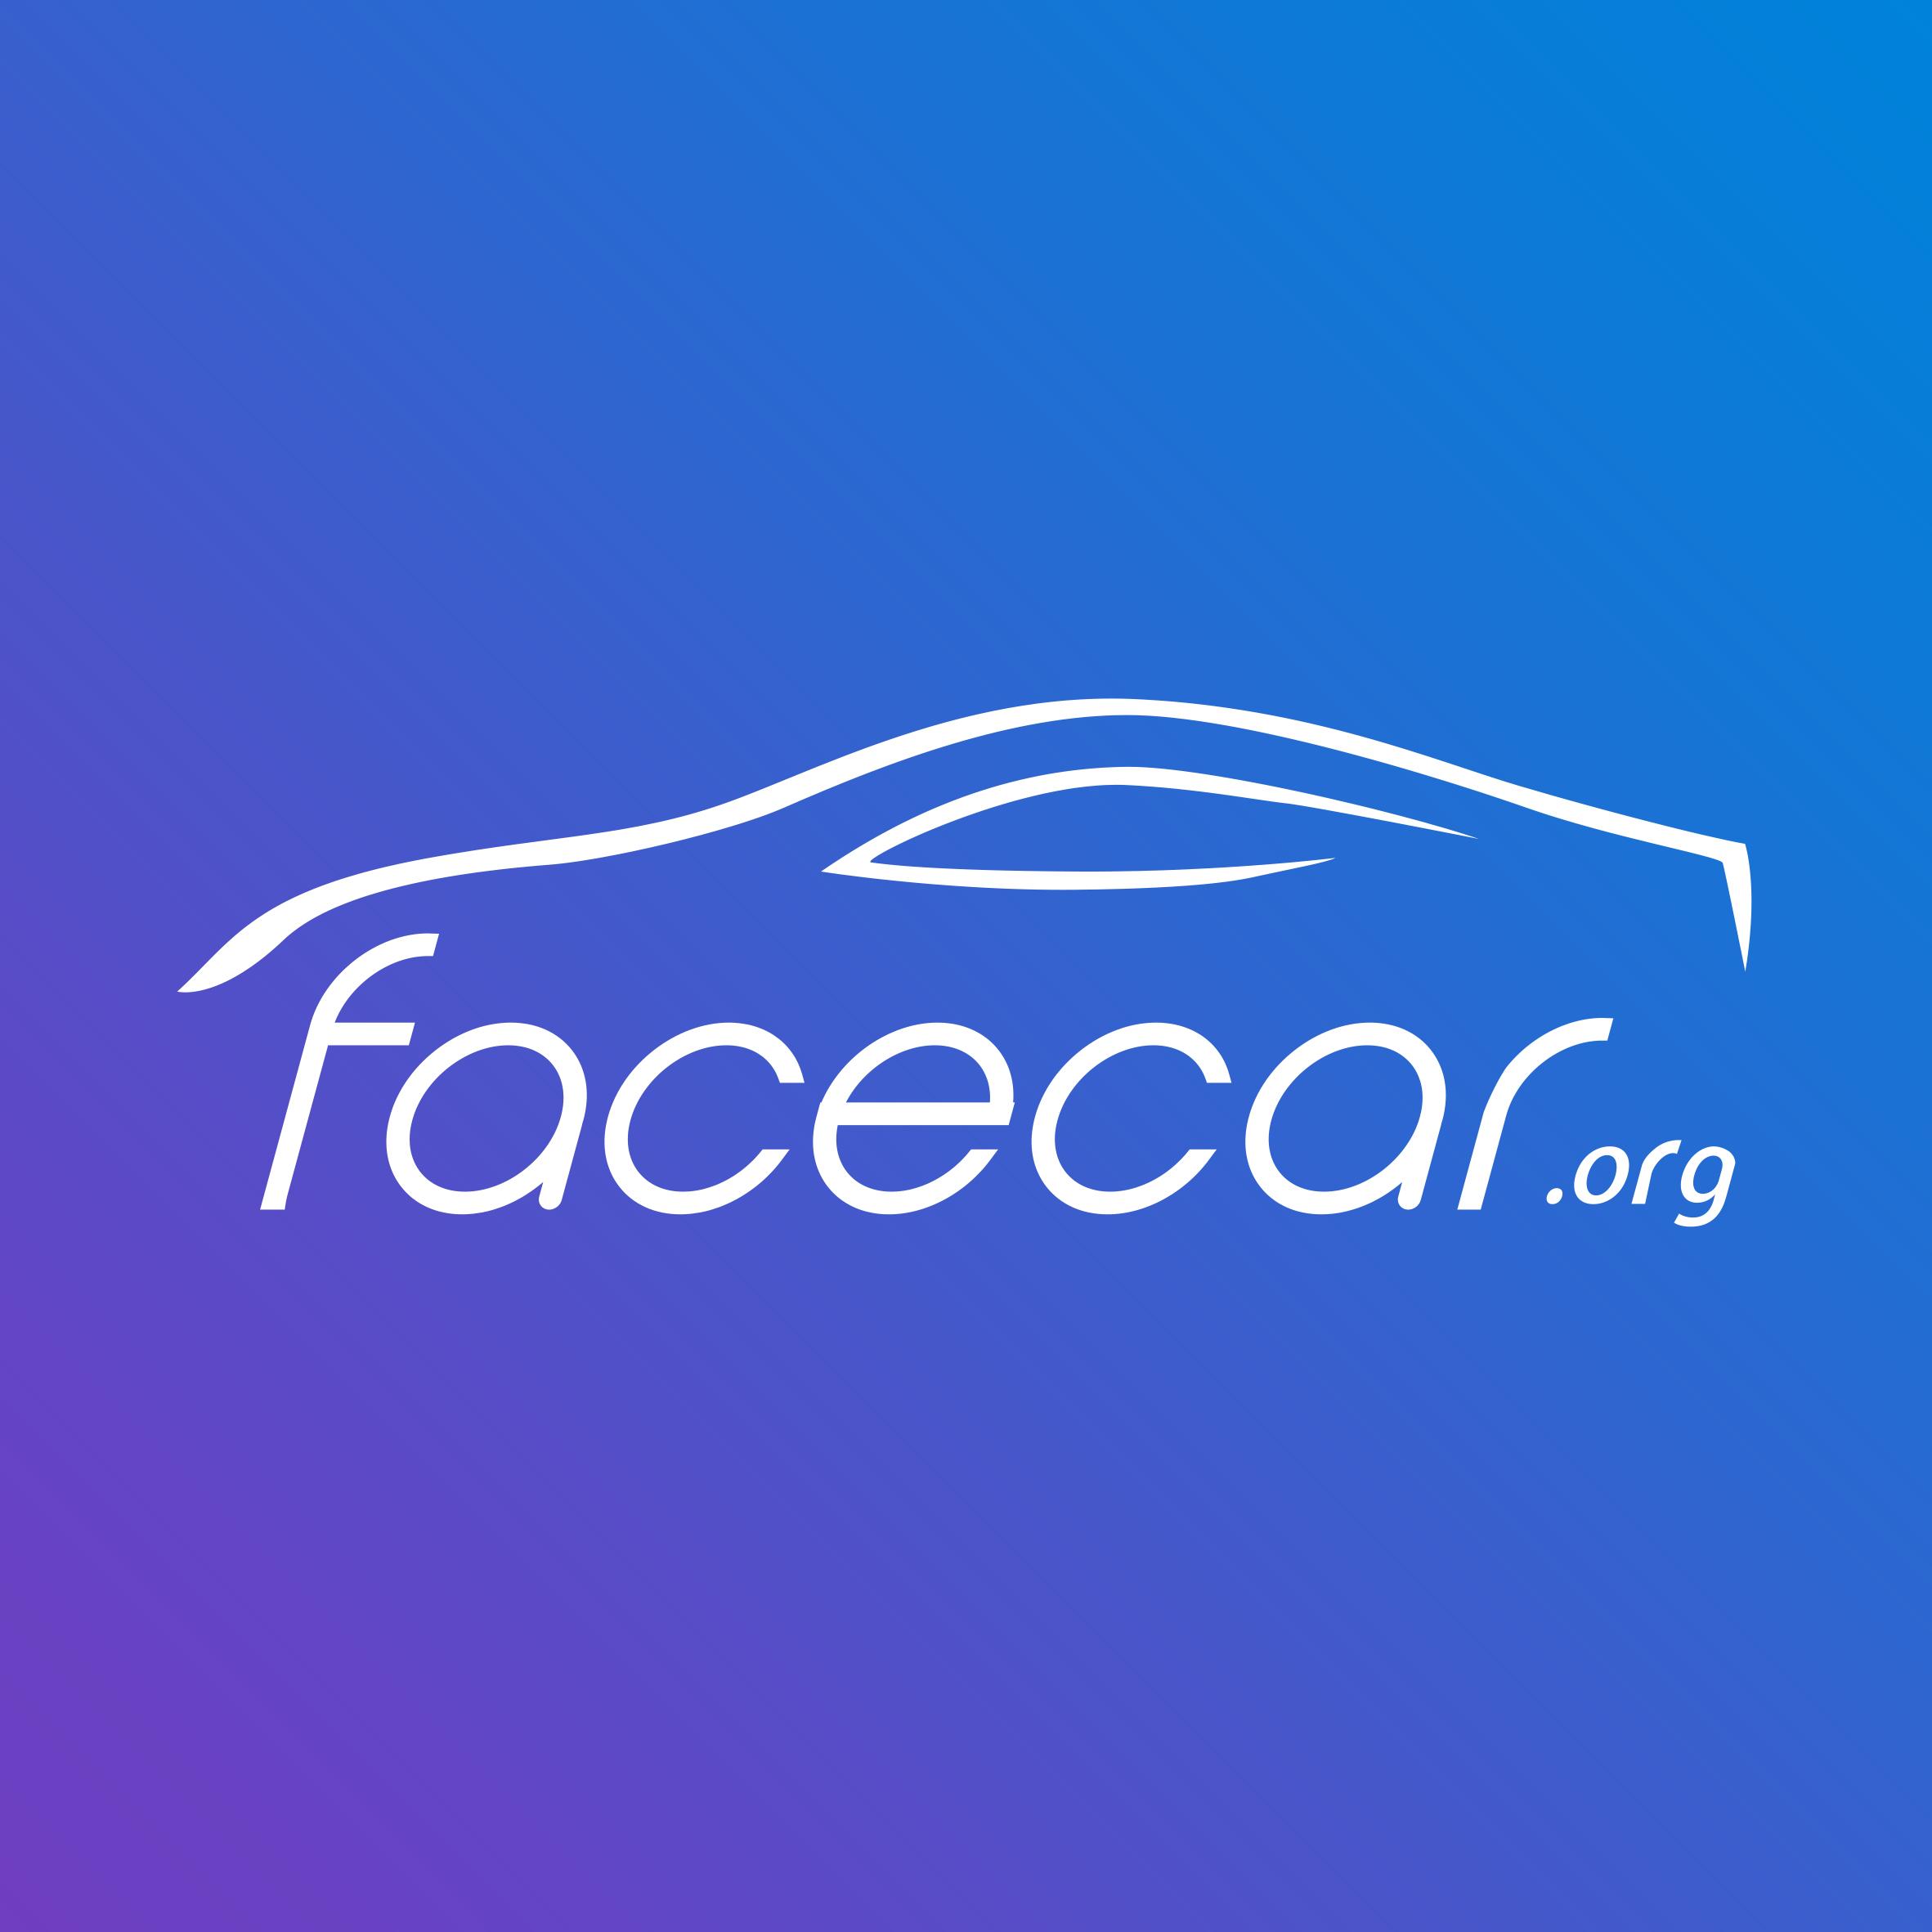 facecar